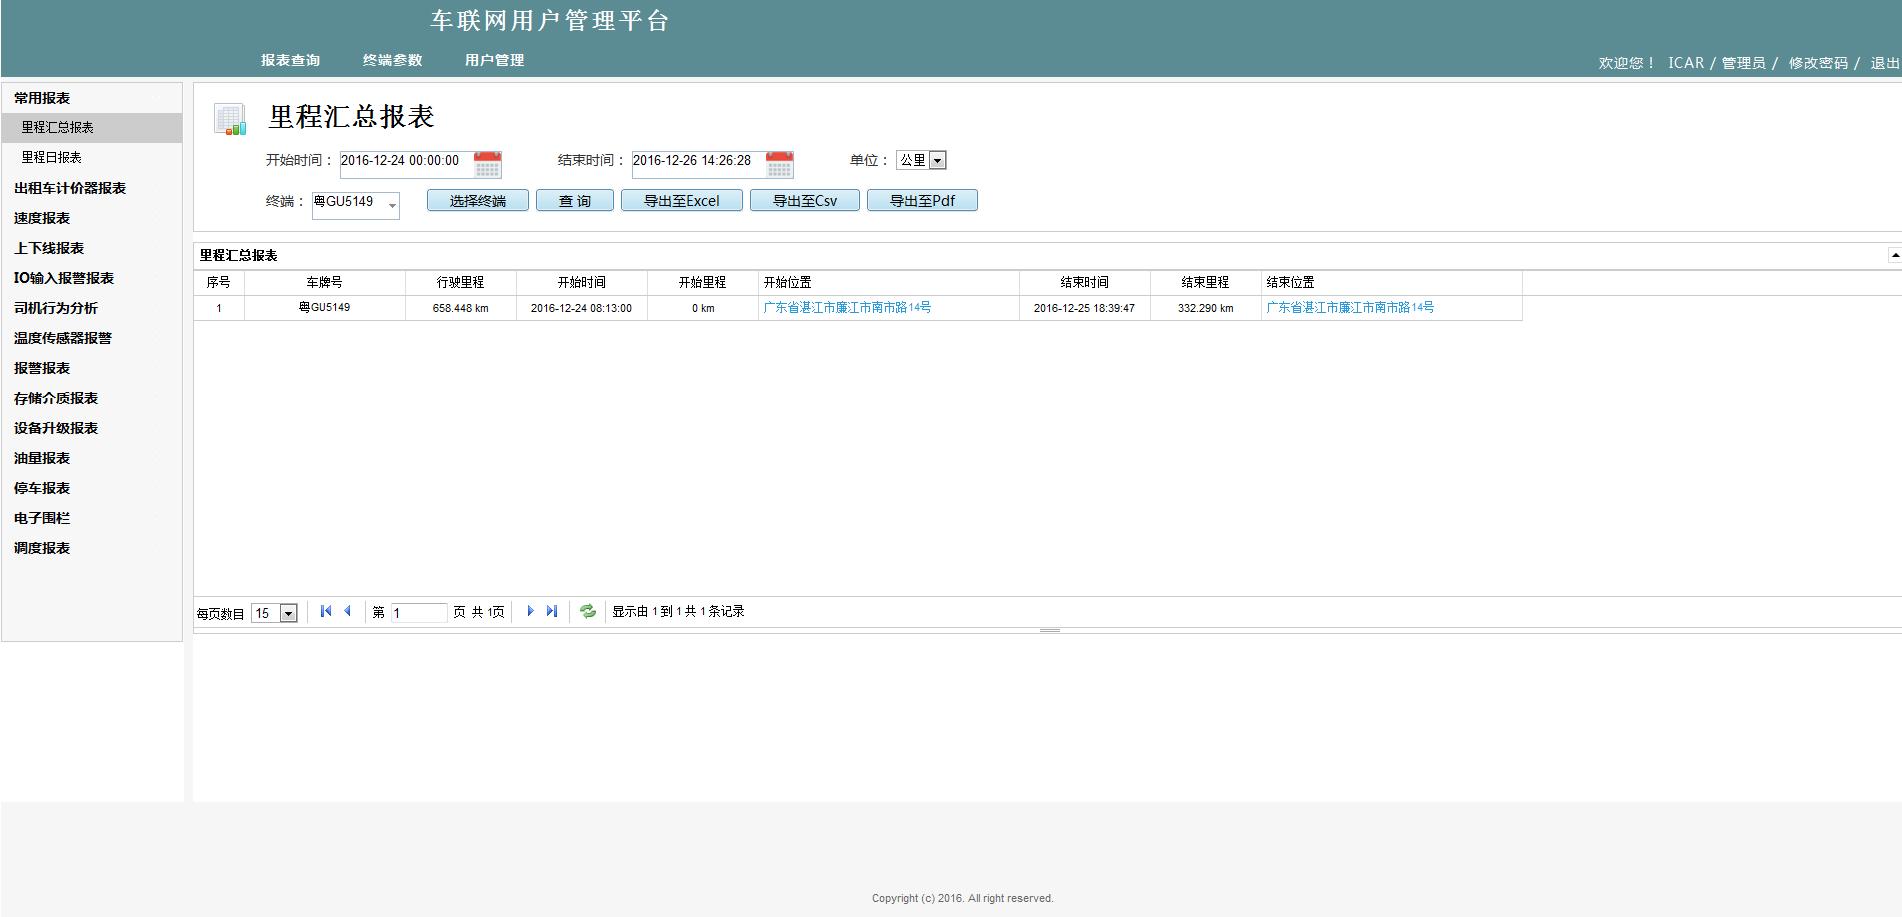 IVMS WEB客户端——智能车辆管理系统平台 第1张